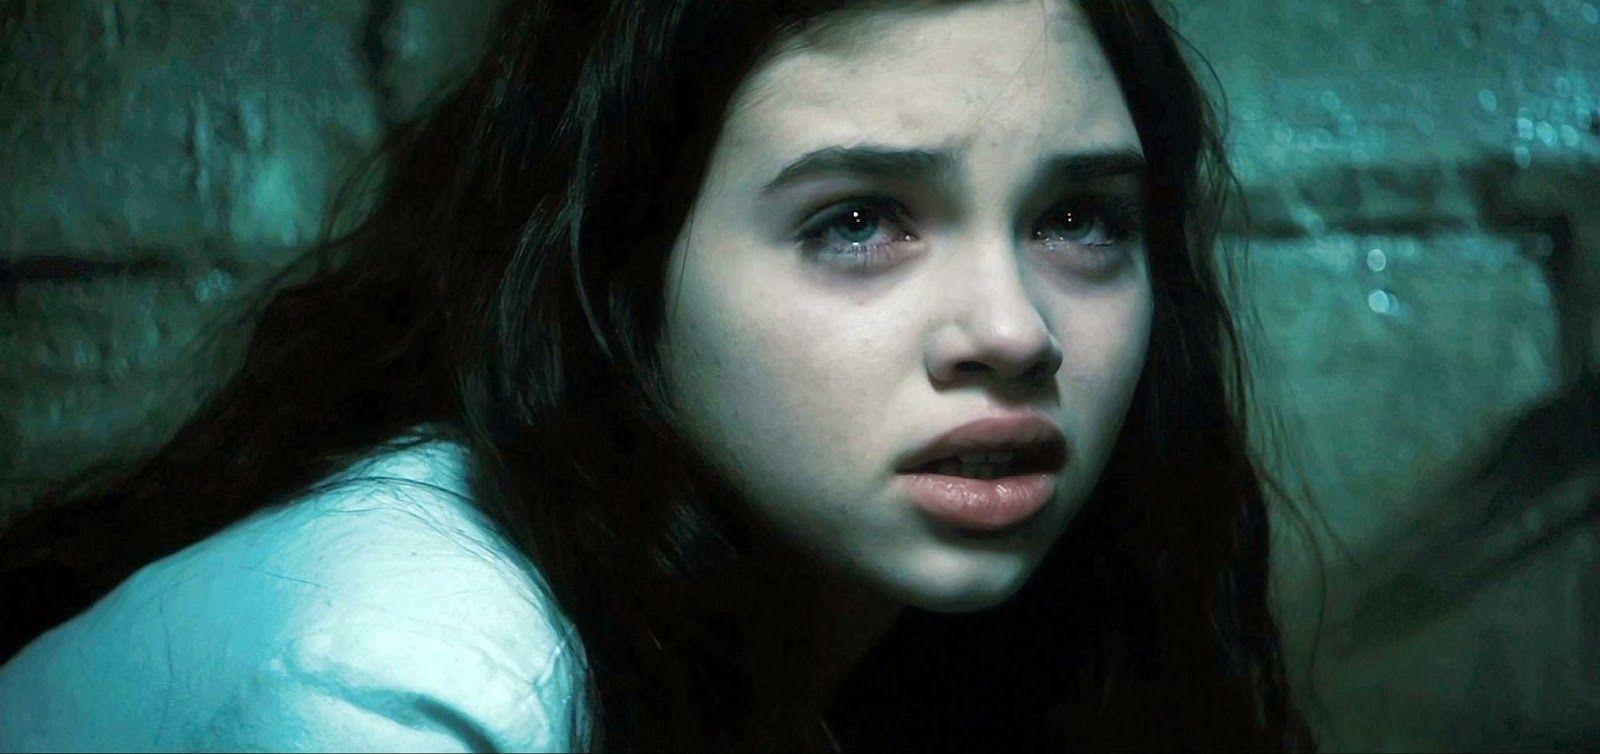 Underworld Awakening: India Eisley as Eve | A Constantly ...